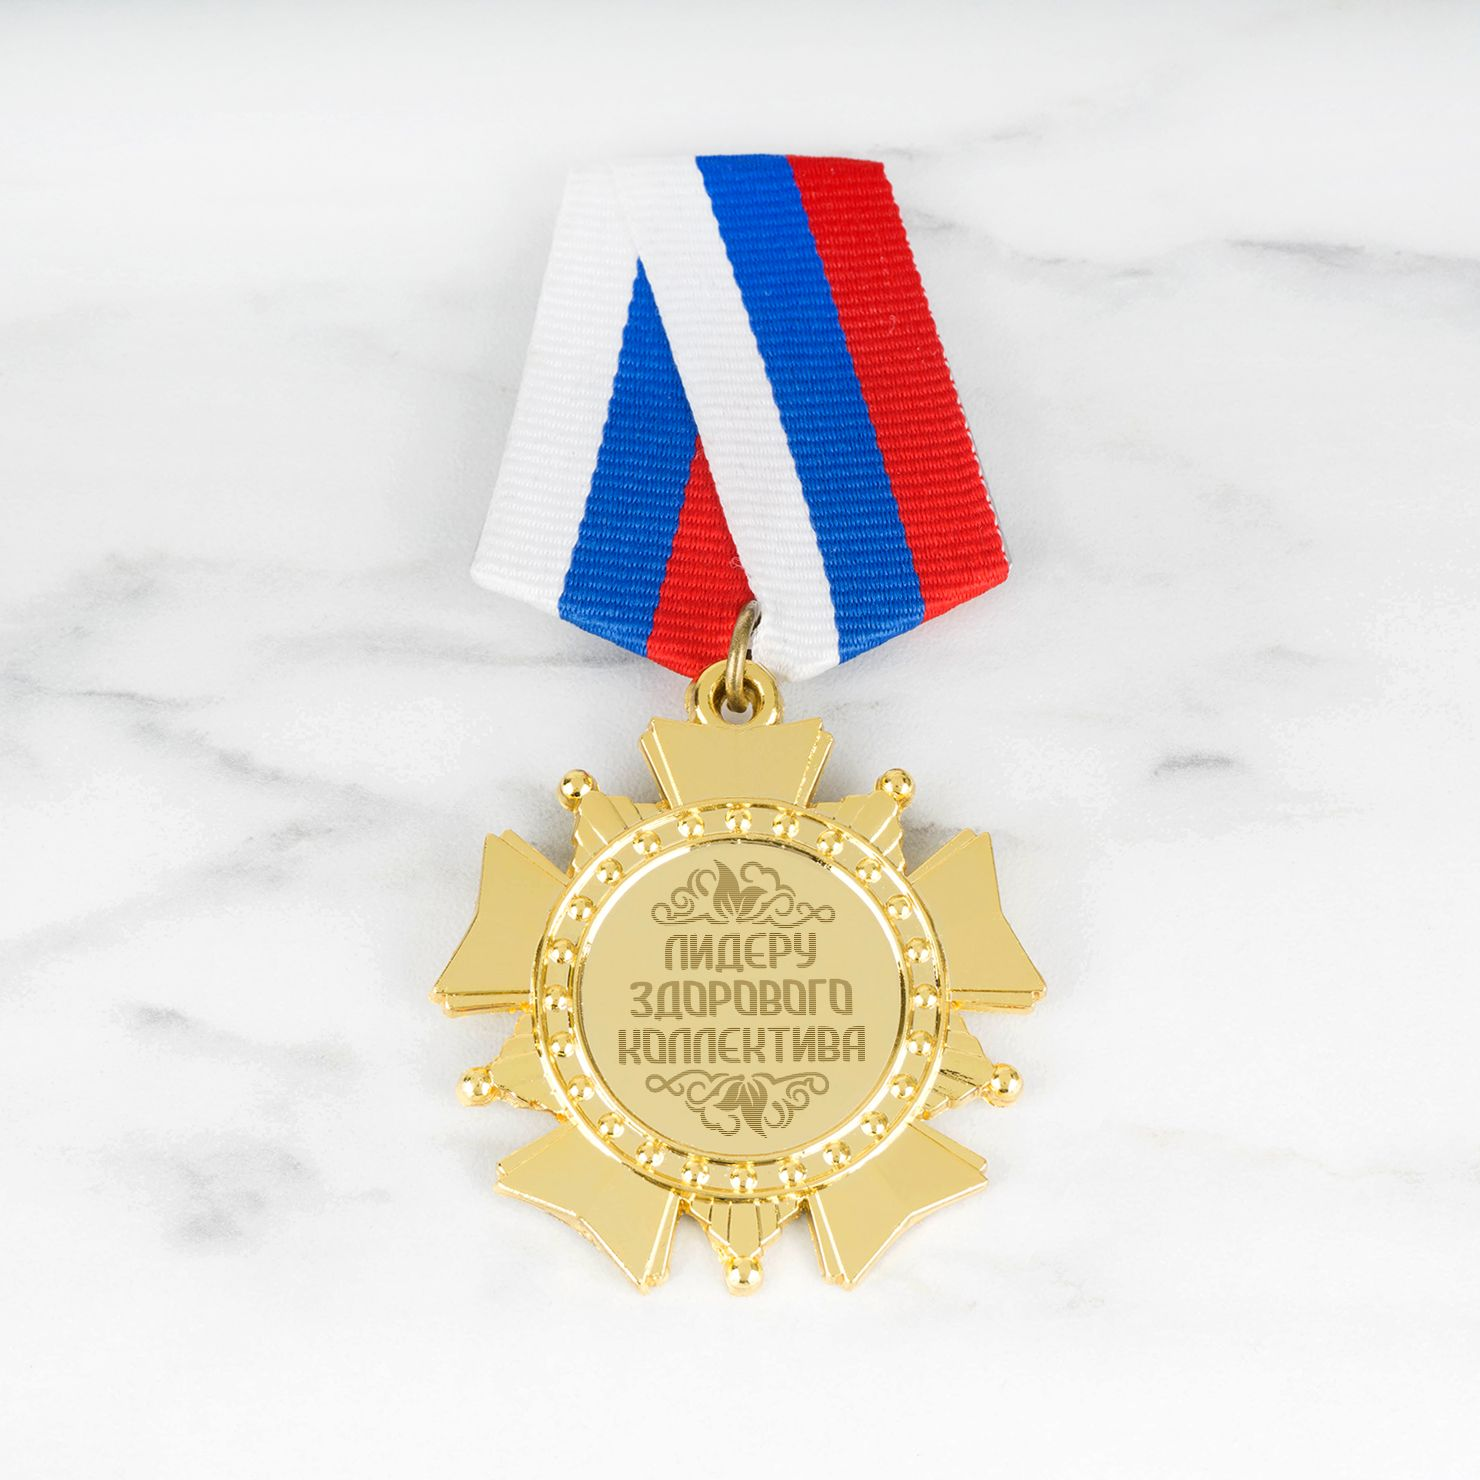 Орден *Лидеру здорового коллектива*